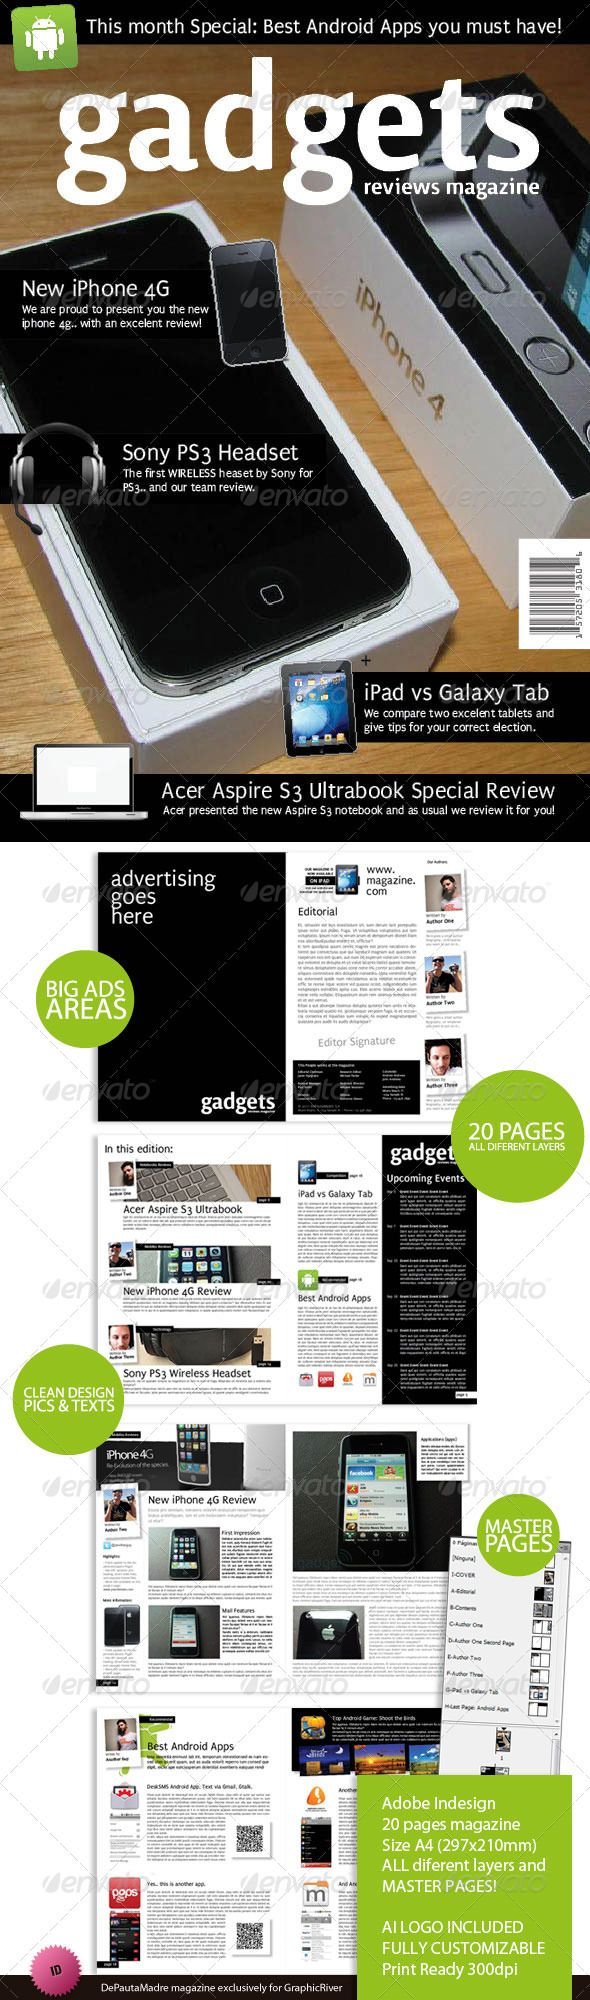 Gadgets Magazine Indesign Template | Photobooks | Pinterest